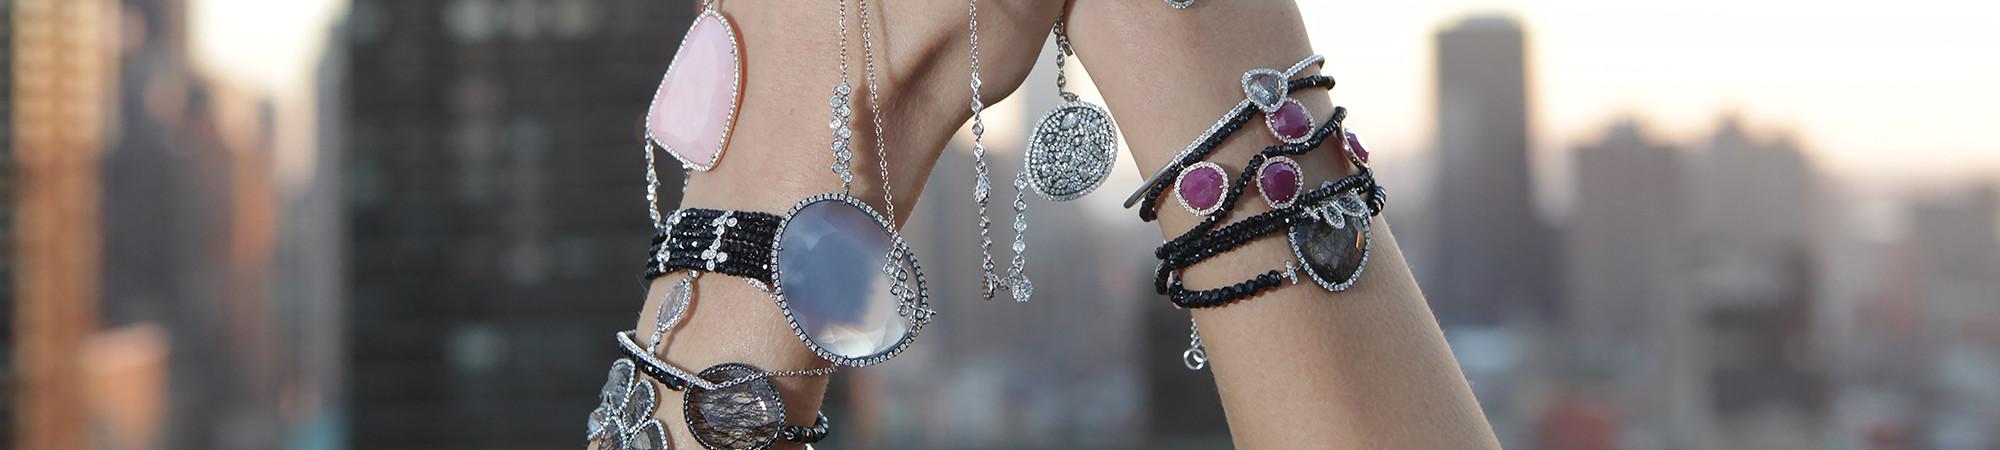 Bennion Jewelers luxury bracelets in downtown Salt Lake City, UT.